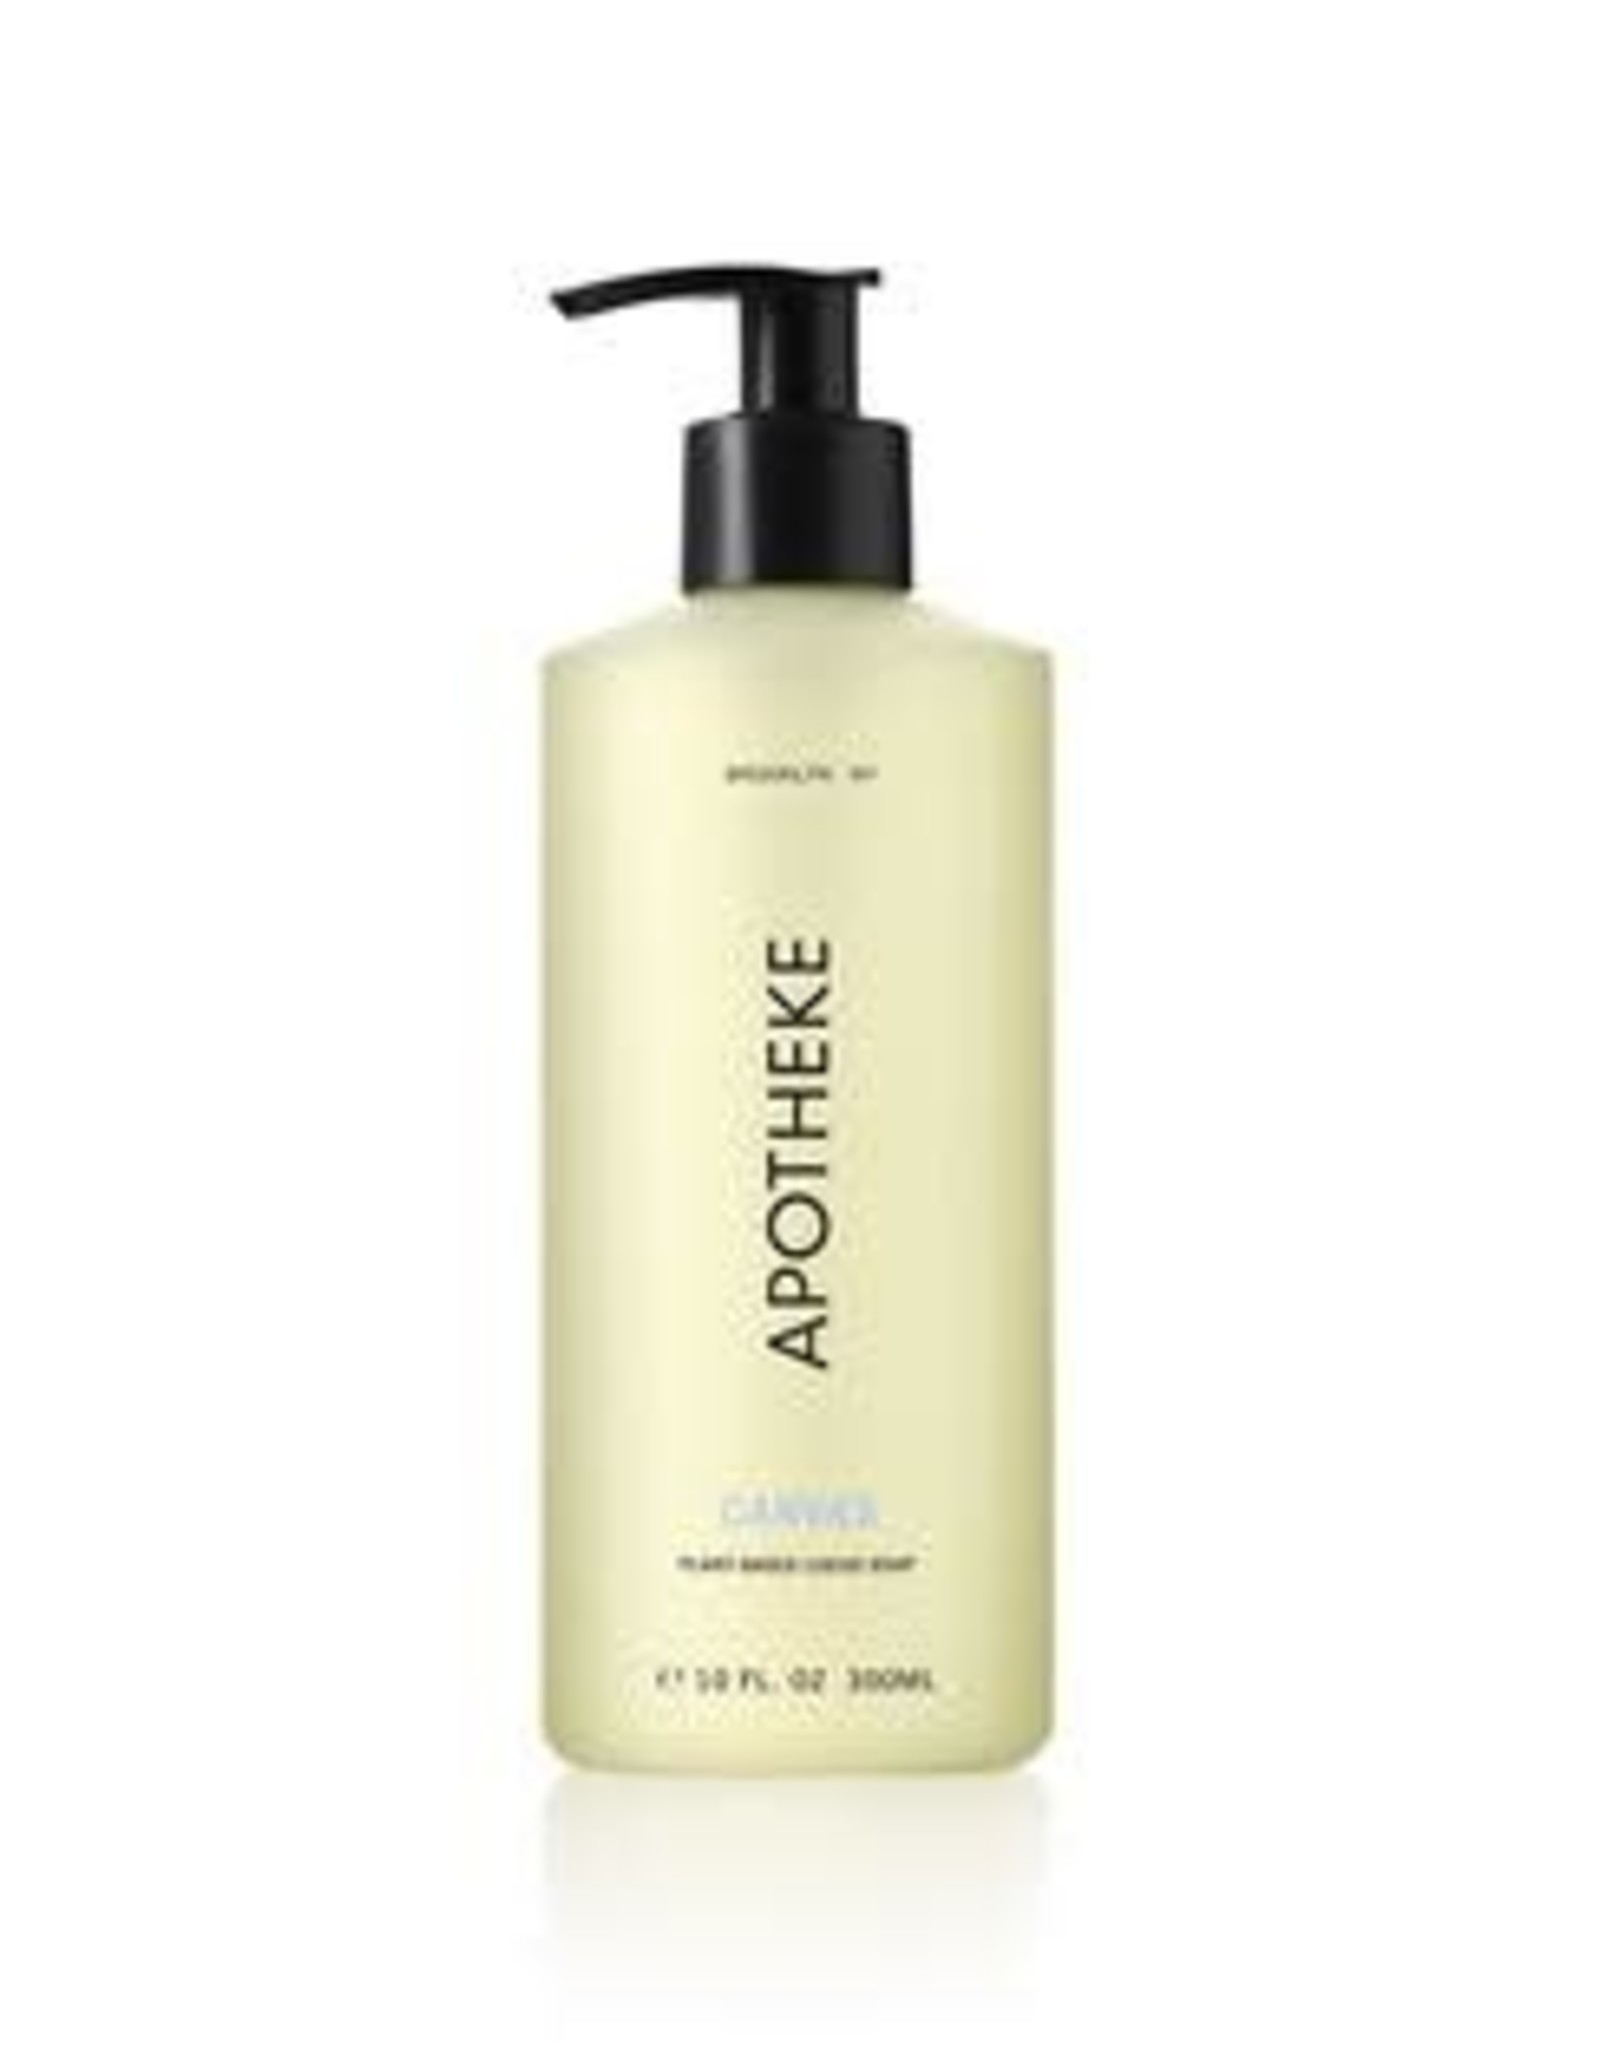 Apotheke Apotheke Canvas Liquid Soap